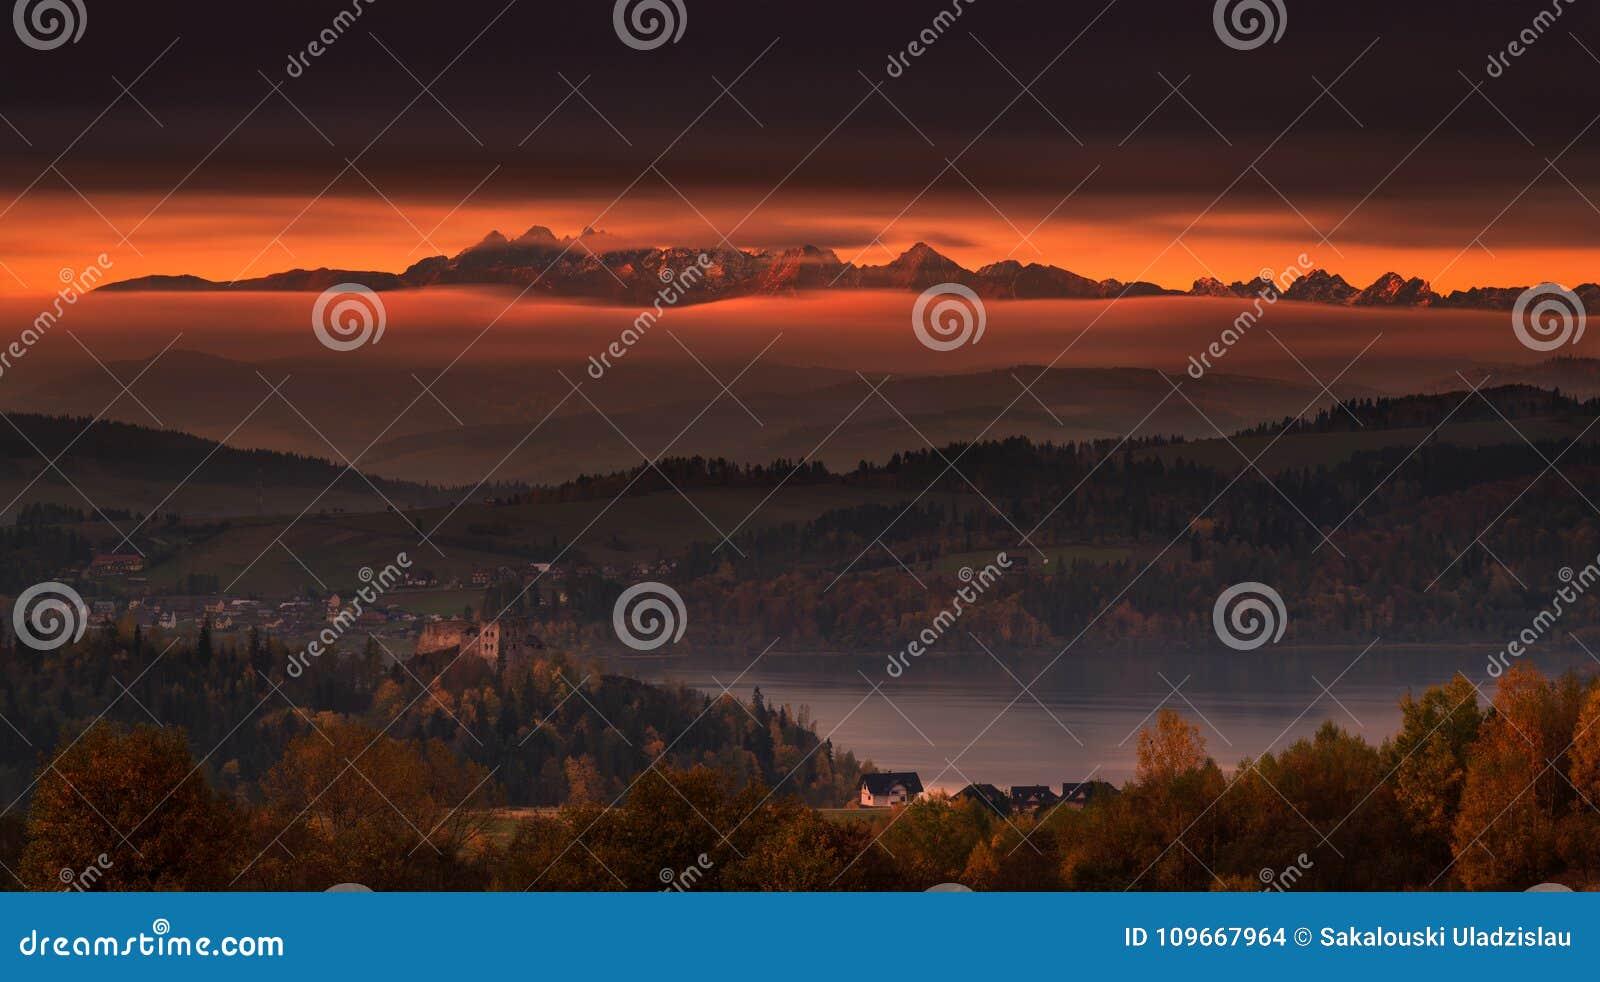 Polen, Autumn Morning Epische Zonsopgang over Tatry-Bergen: Mening